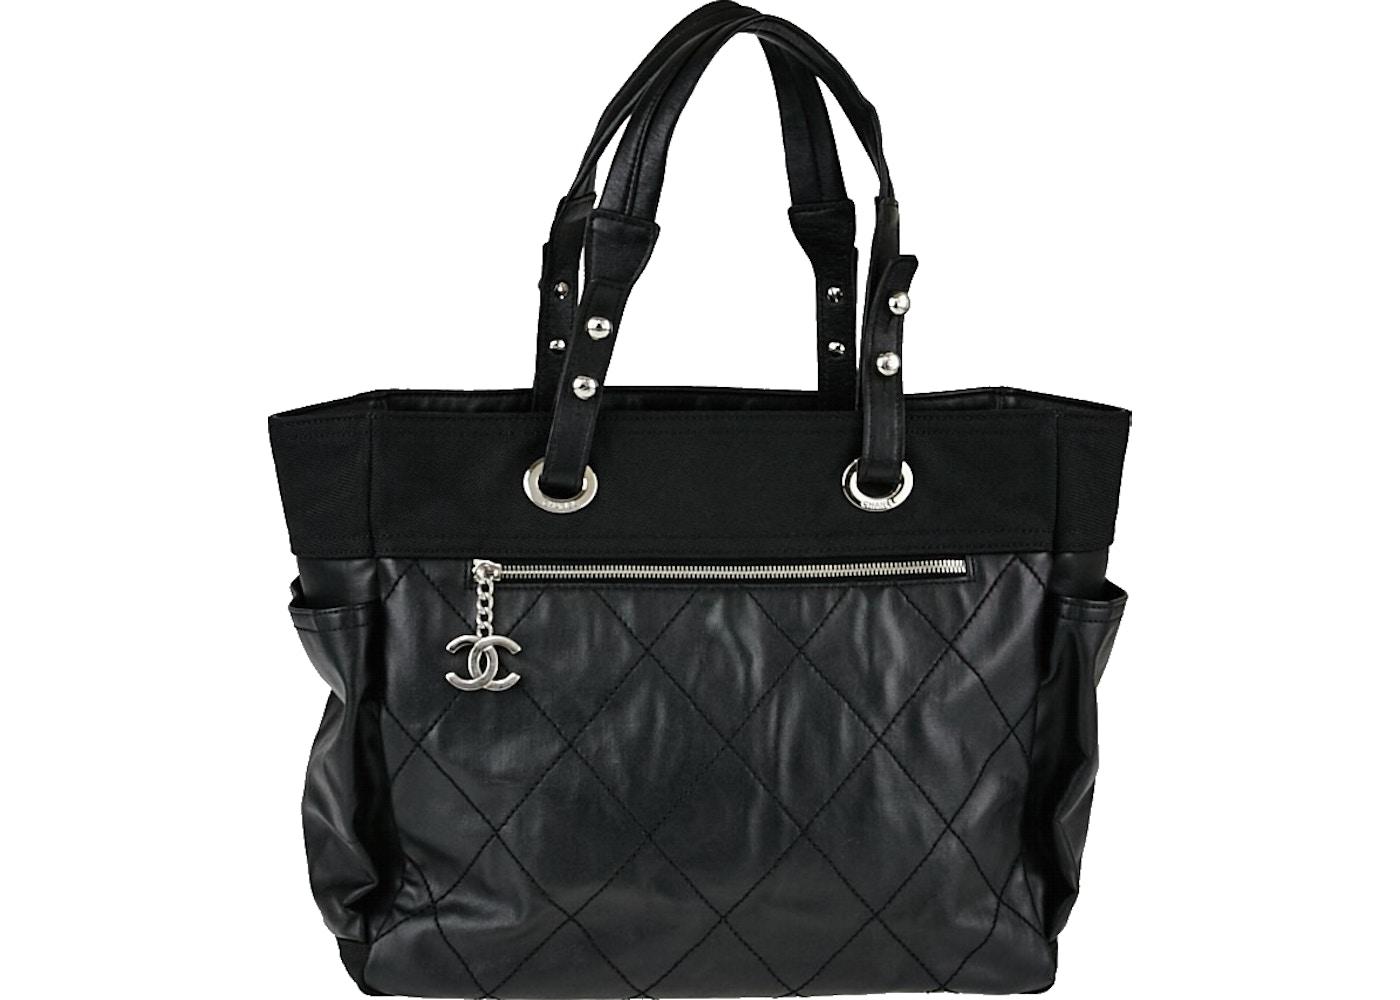 47604c7eeca8 Chanel Shopping Tote Paris Biarritz Quilted Coated Grand Black. Paris  Biarritz Quilted Coated Grand Black